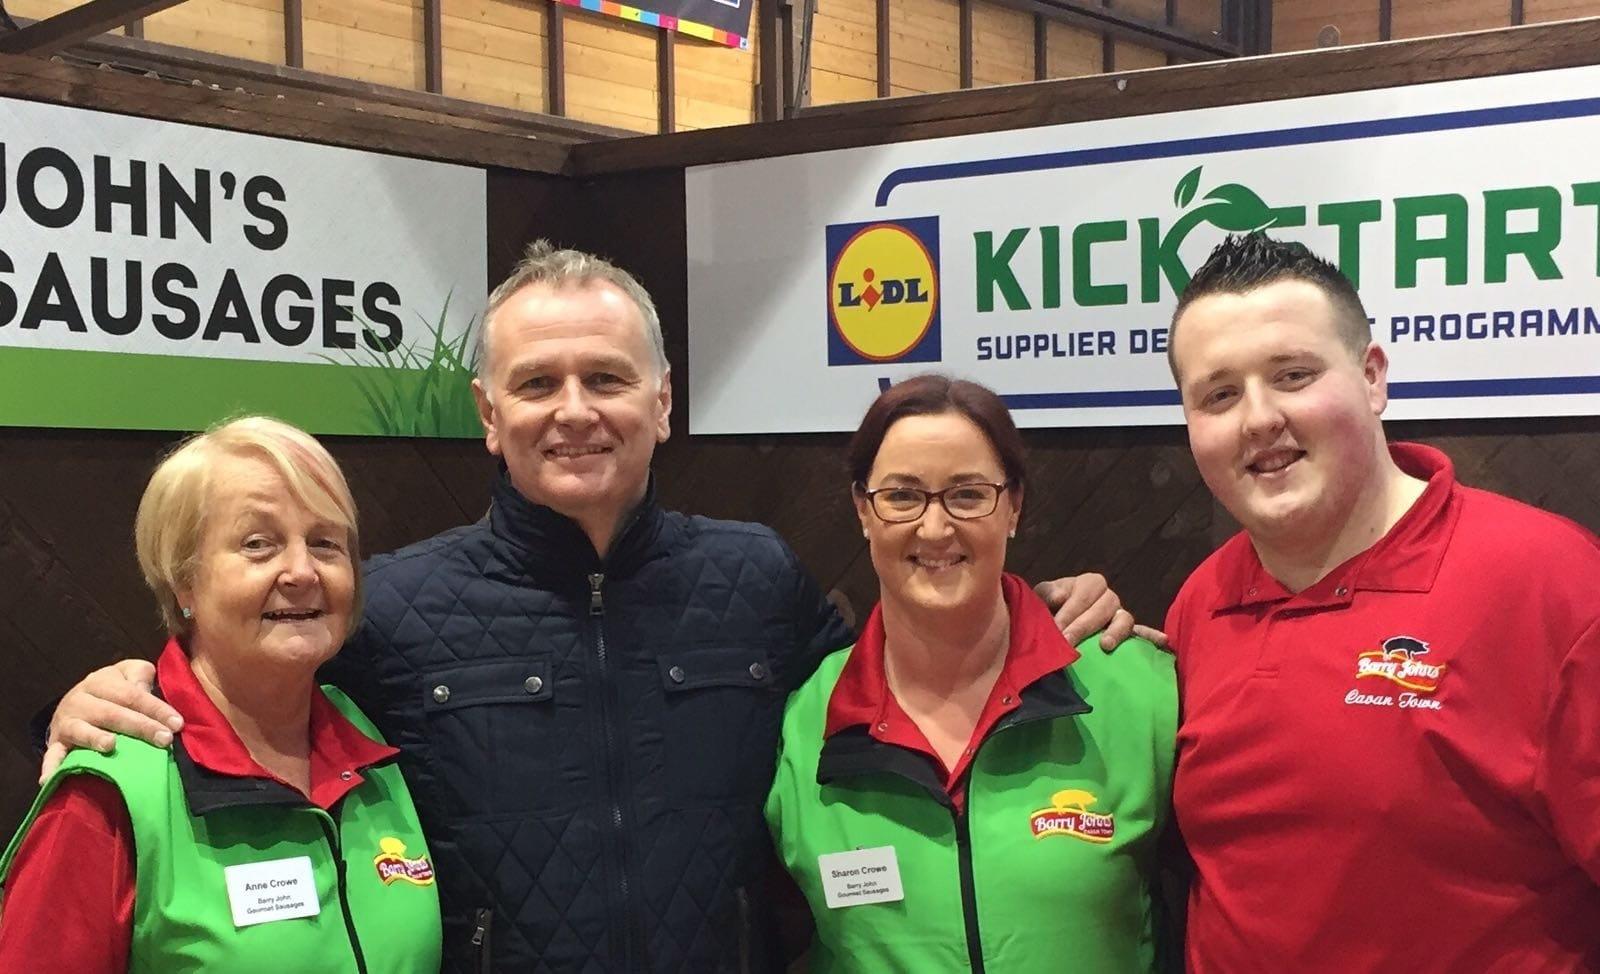 Lidl Kickstart Irish Producers - National Ploughing Championships - Barry John Sausages - Gourmet Sausages